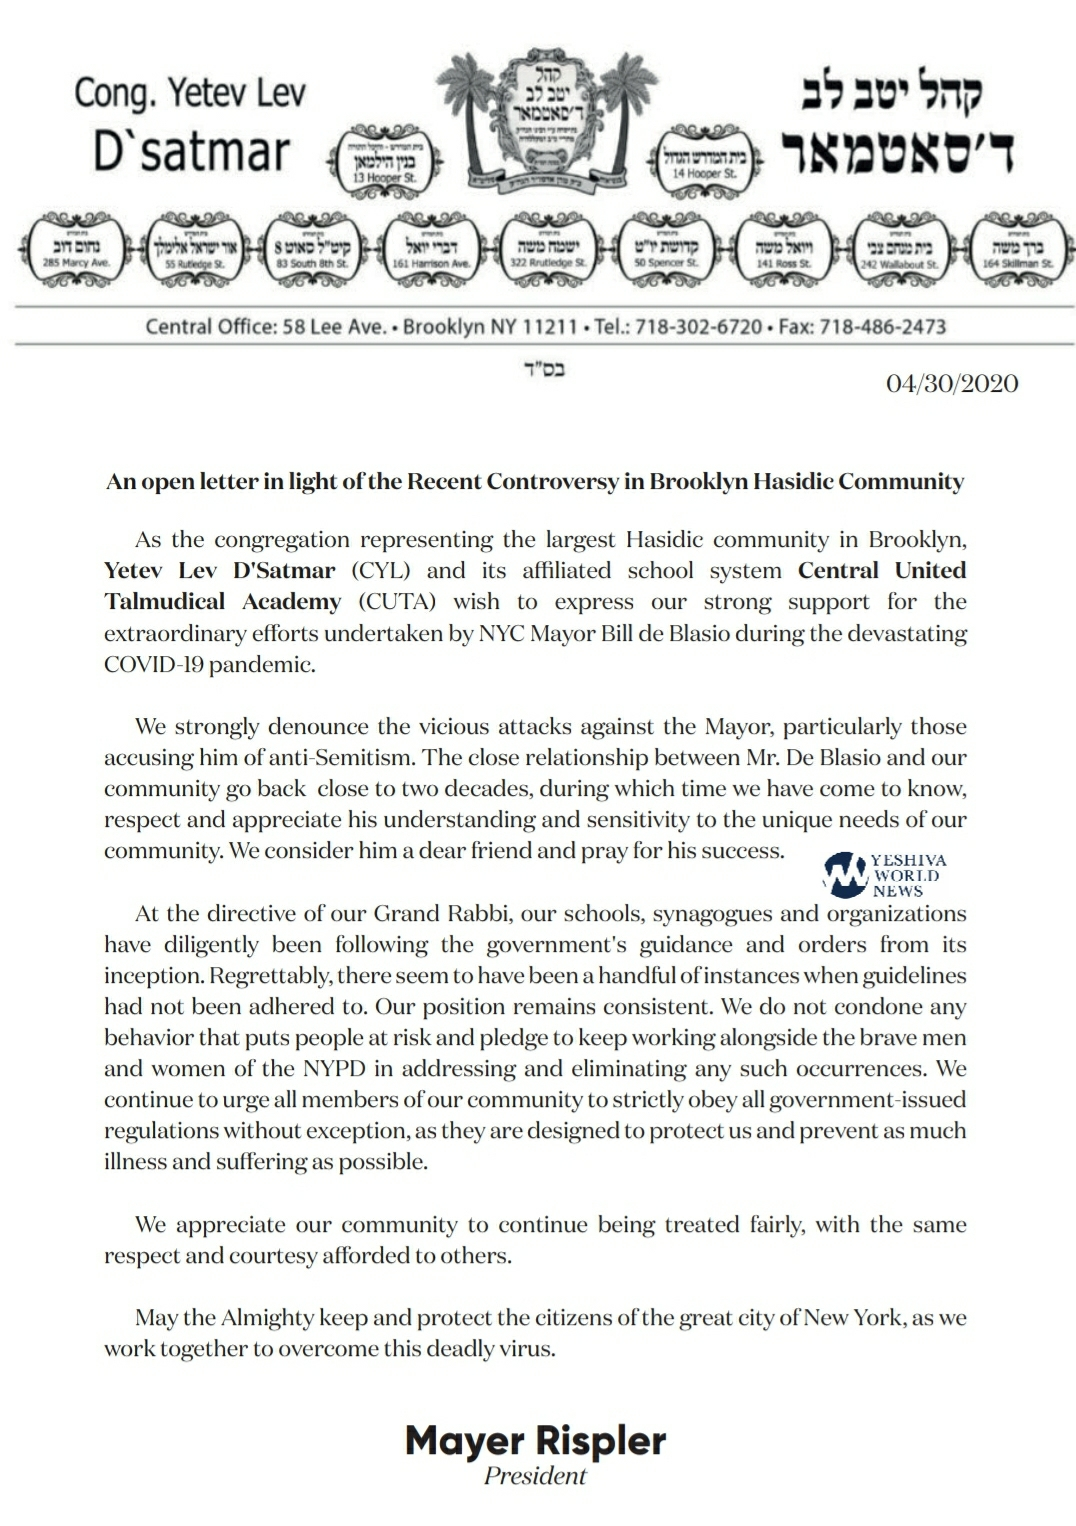 Open Letter From Satmar Kiryas Joel Leadership Following Recent Controversy in Brooklyn Hasidic Community 2